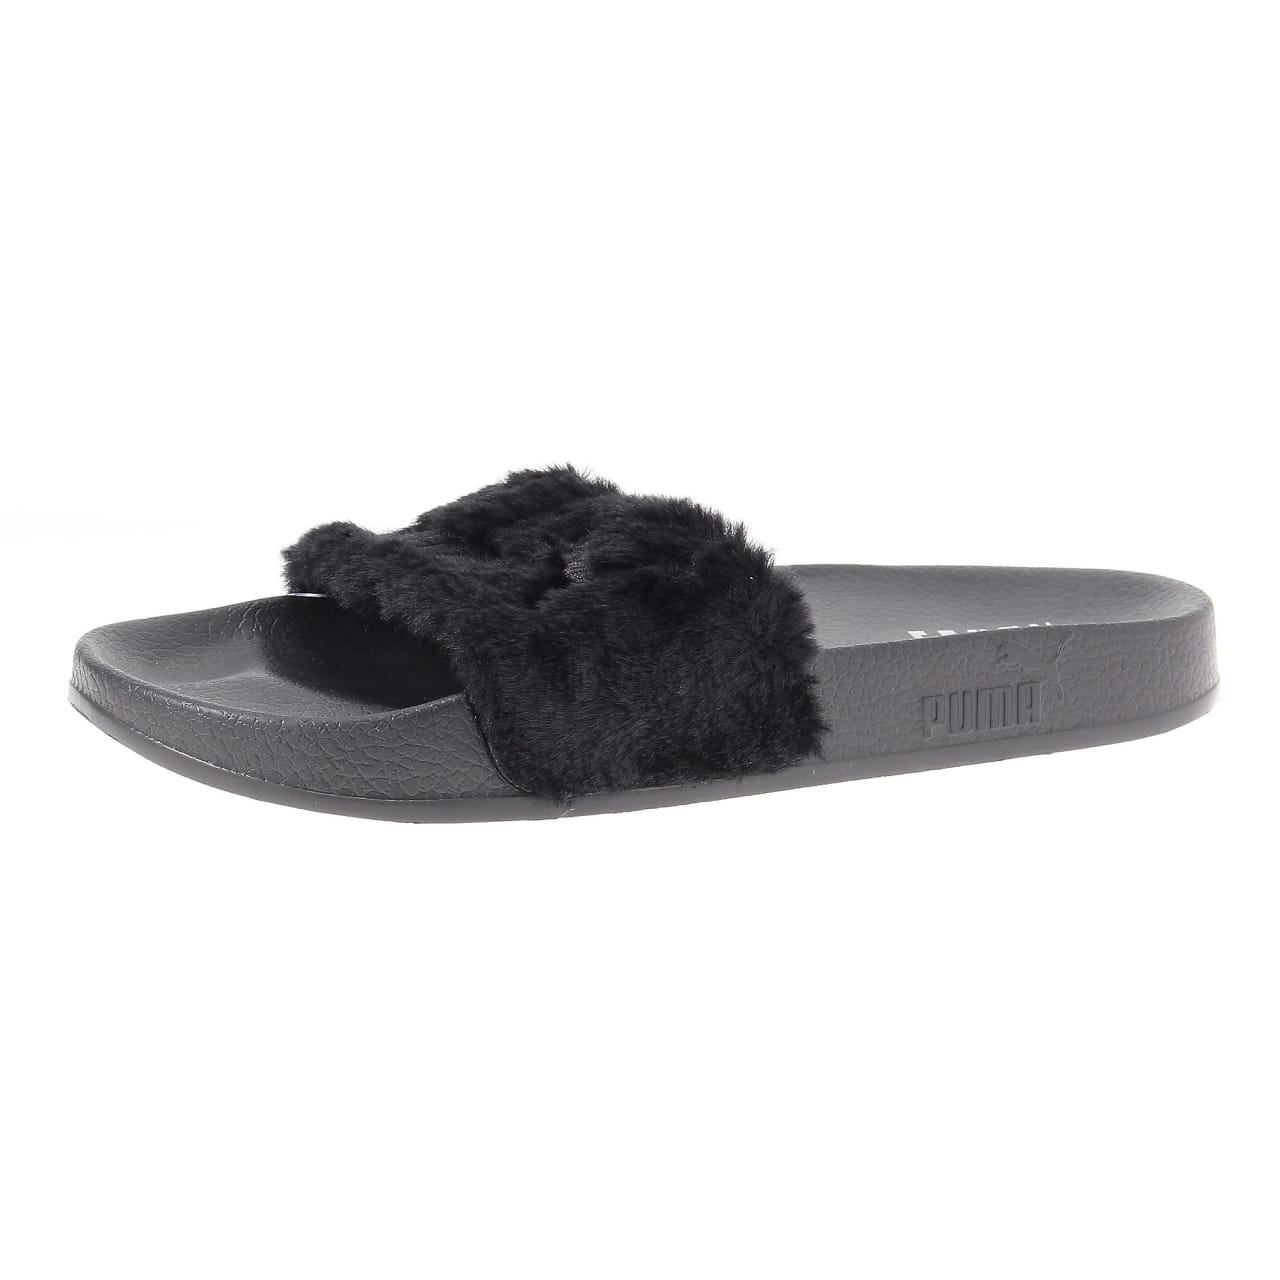 rihanna black puma sandals